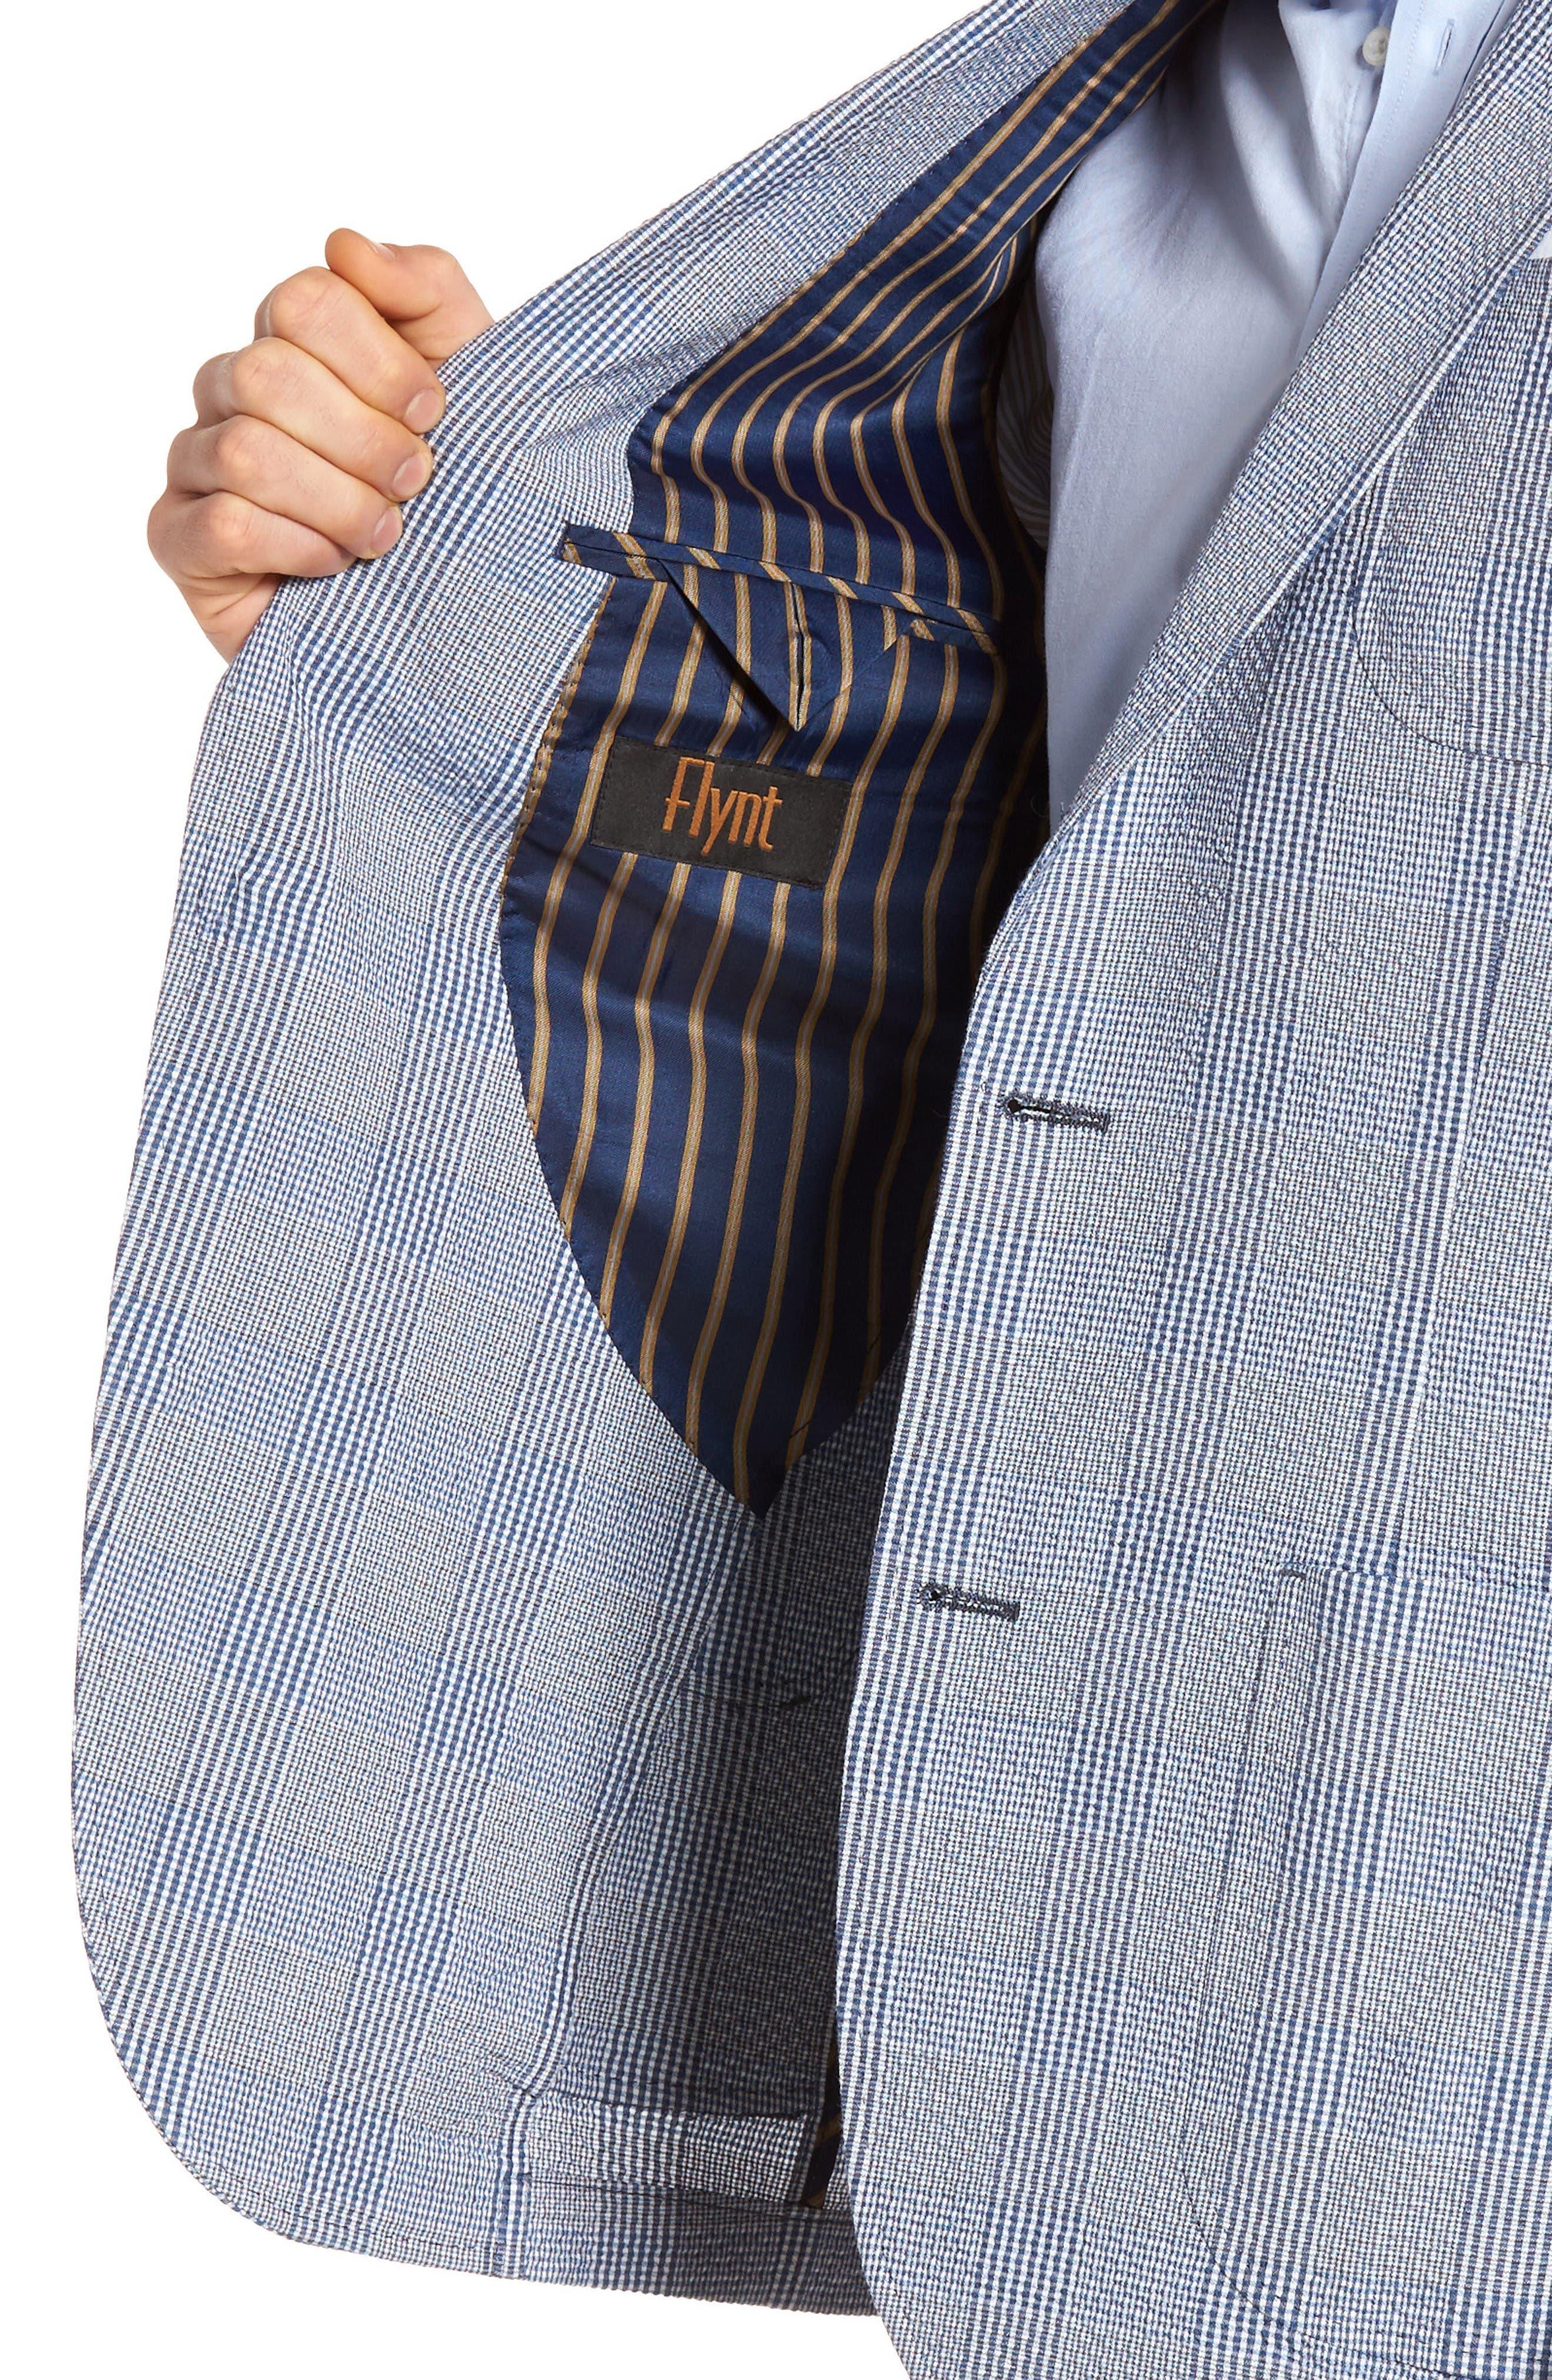 Babbitt Plaid Seersucker Sport Coat,                             Alternate thumbnail 4, color,                             Blue